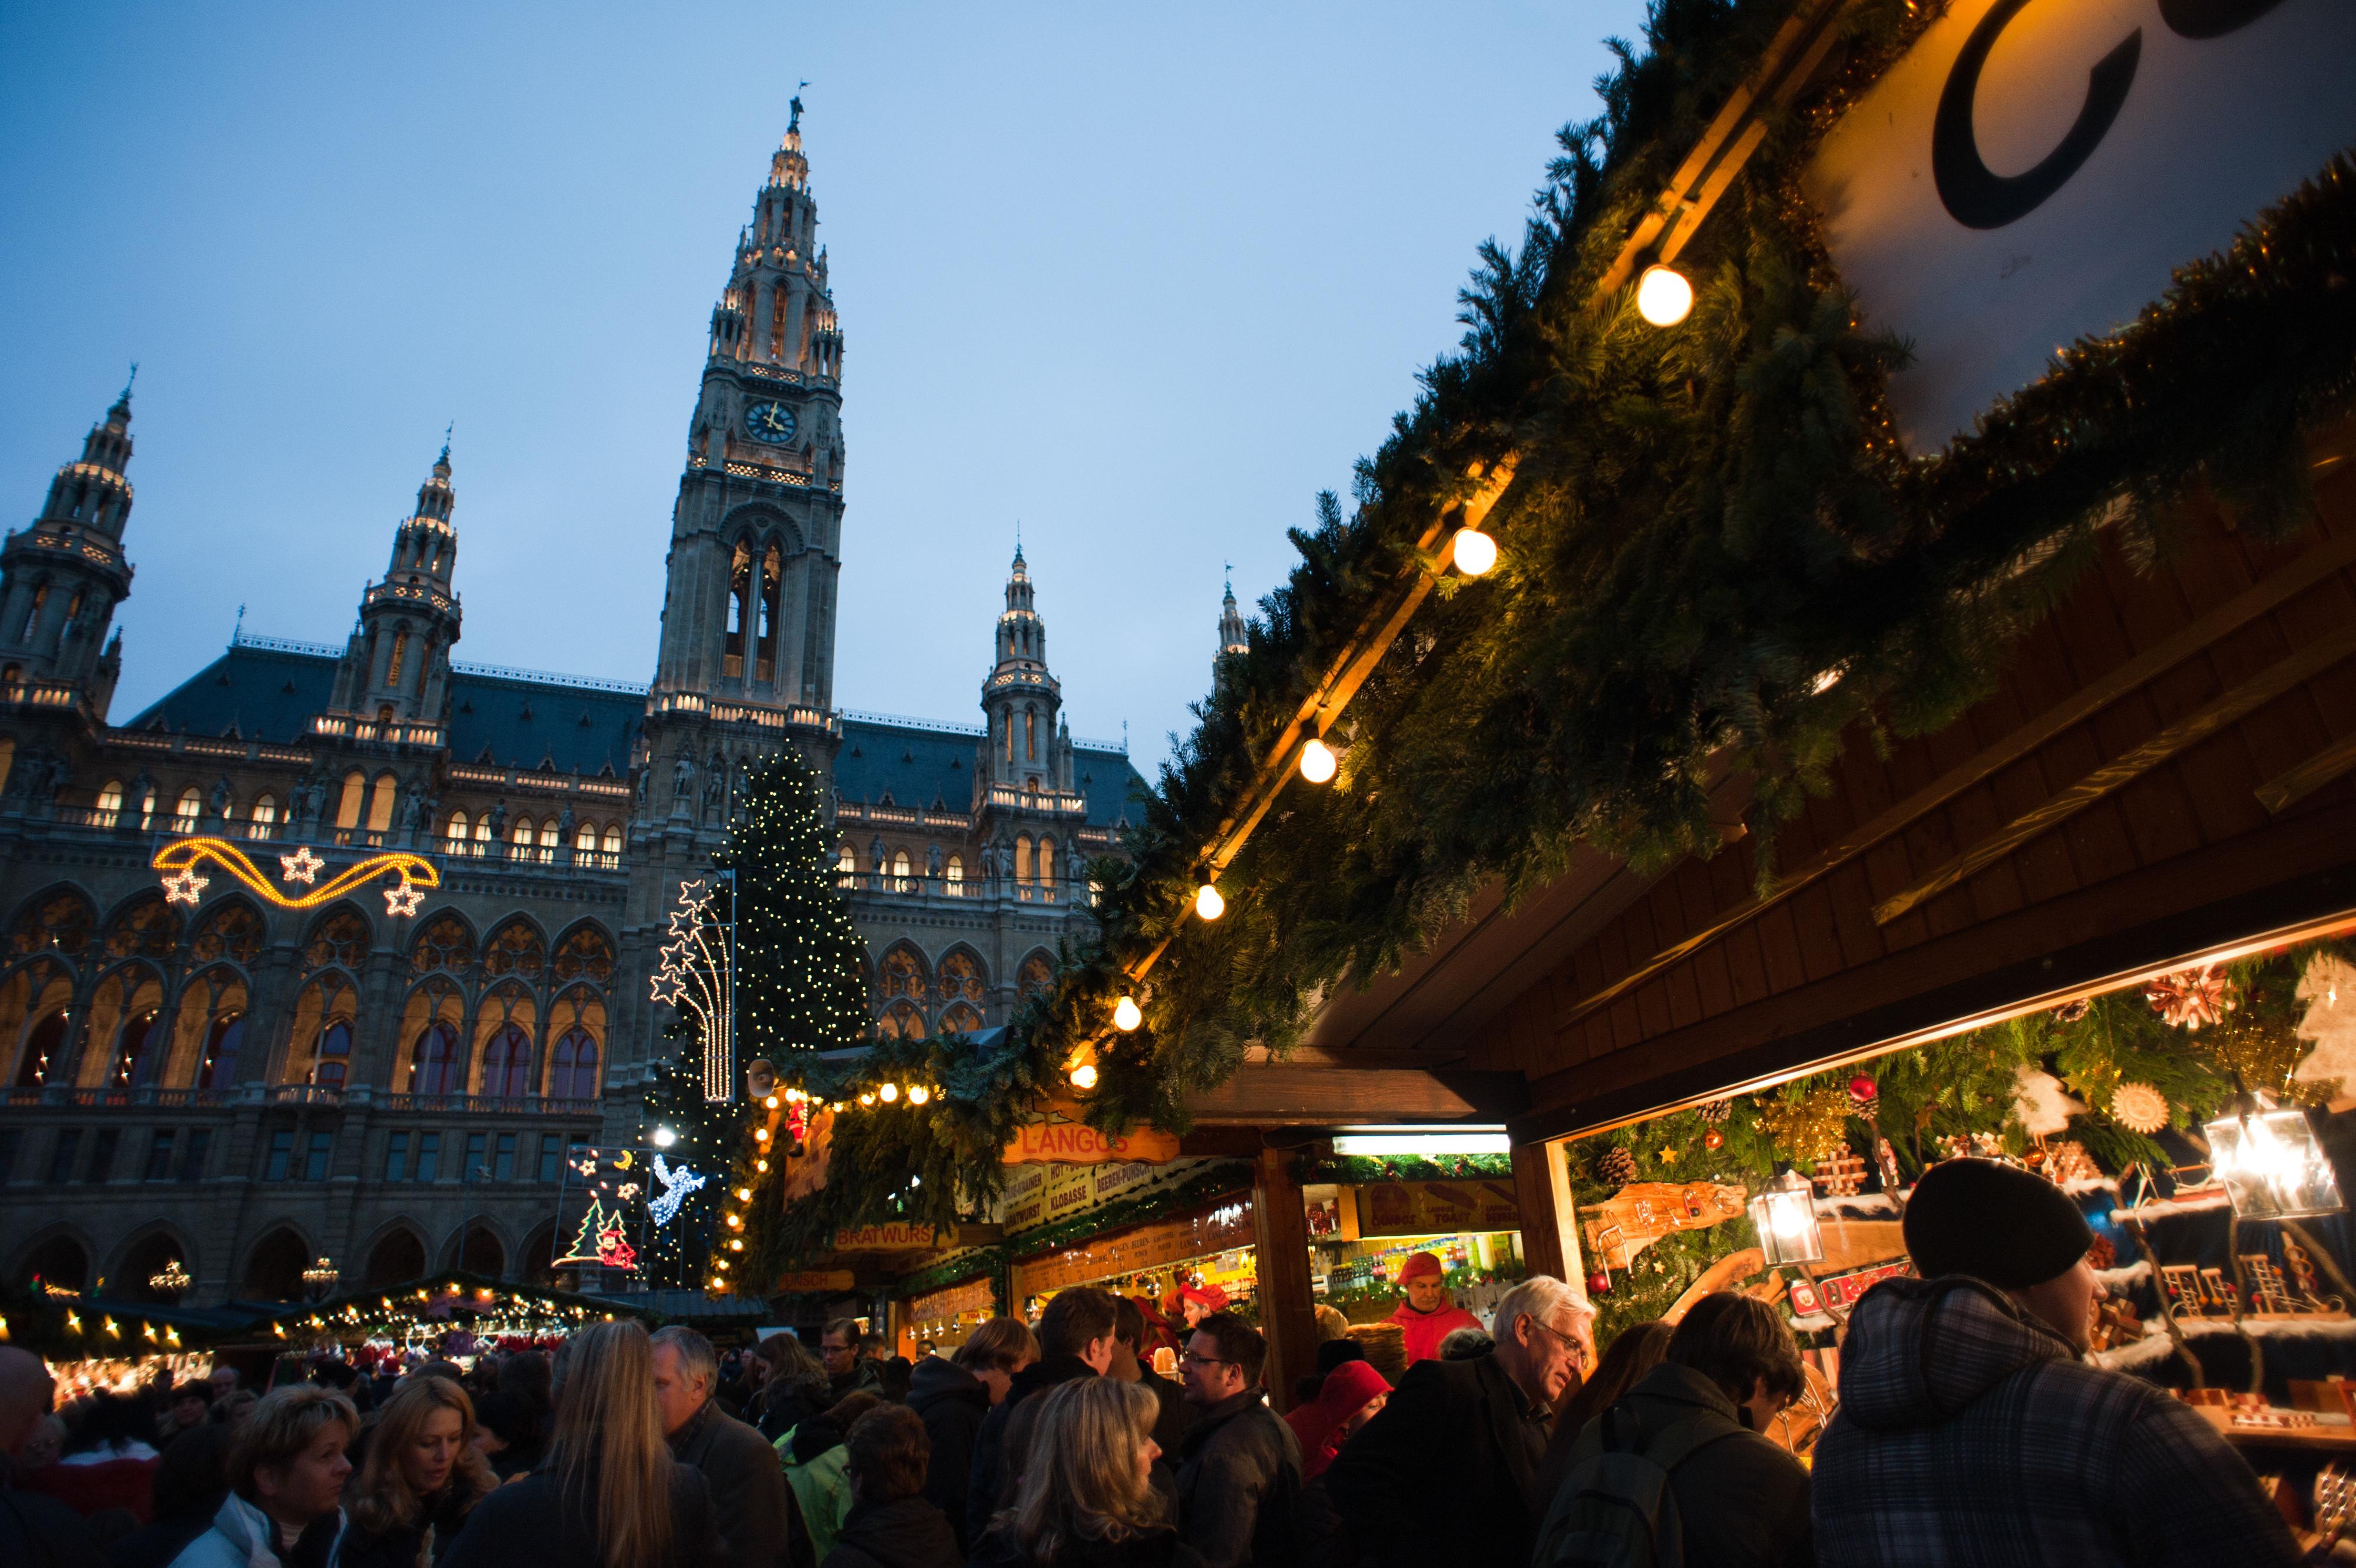 Beautiful Christmas Market In Europe #1: A_Christmas_festival_near_the_Rathaus,_Friedrich_Schmidt_Platz.Vienna,_Austria,_Western_Europe.jpg